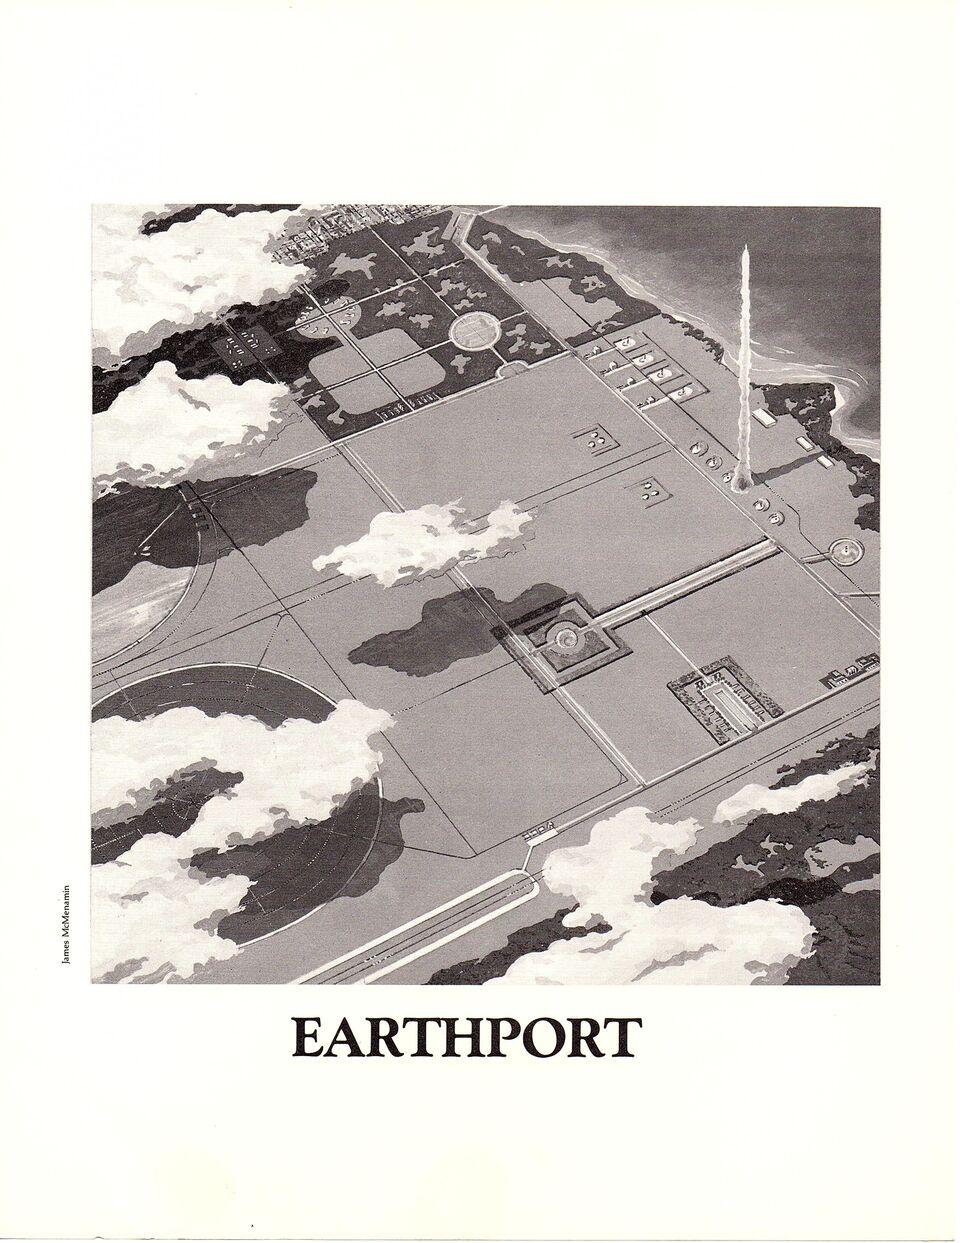 59cbf465d7d51800012f81b2_Earthport Cover picture.jpg